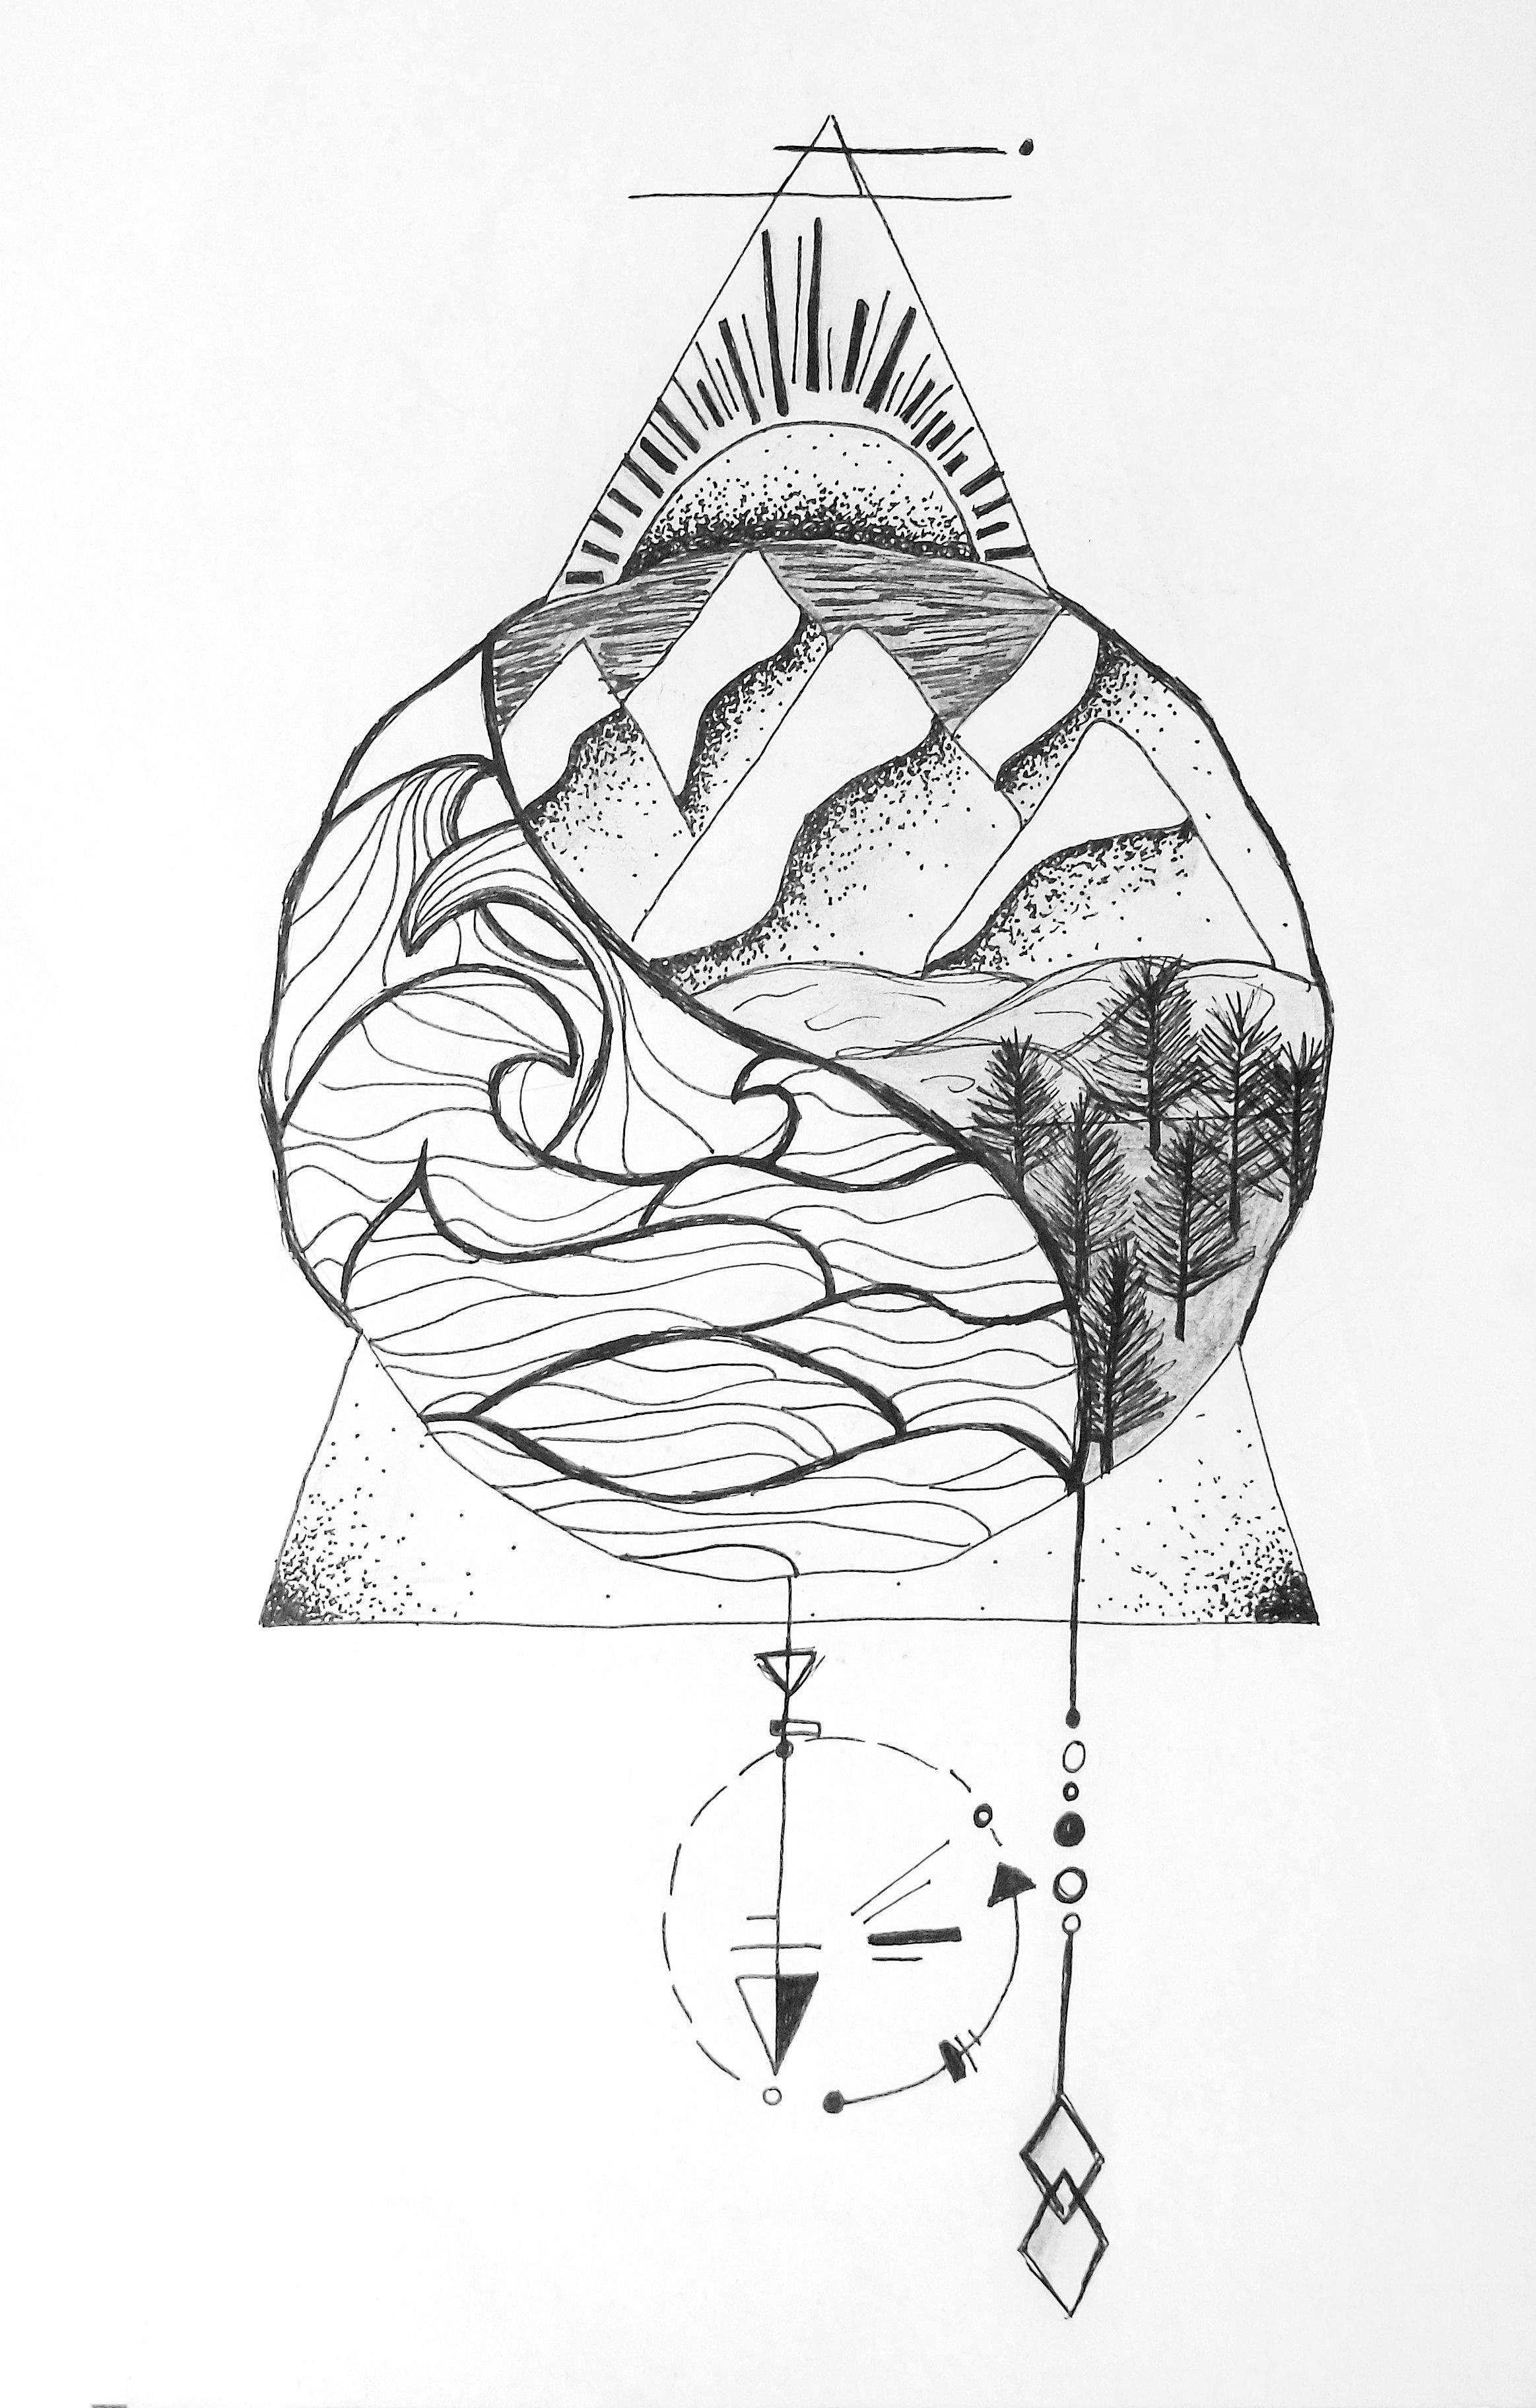 sea and land nautical natural ying yang geometric zentangle tattoo design illustration tattoos. Black Bedroom Furniture Sets. Home Design Ideas